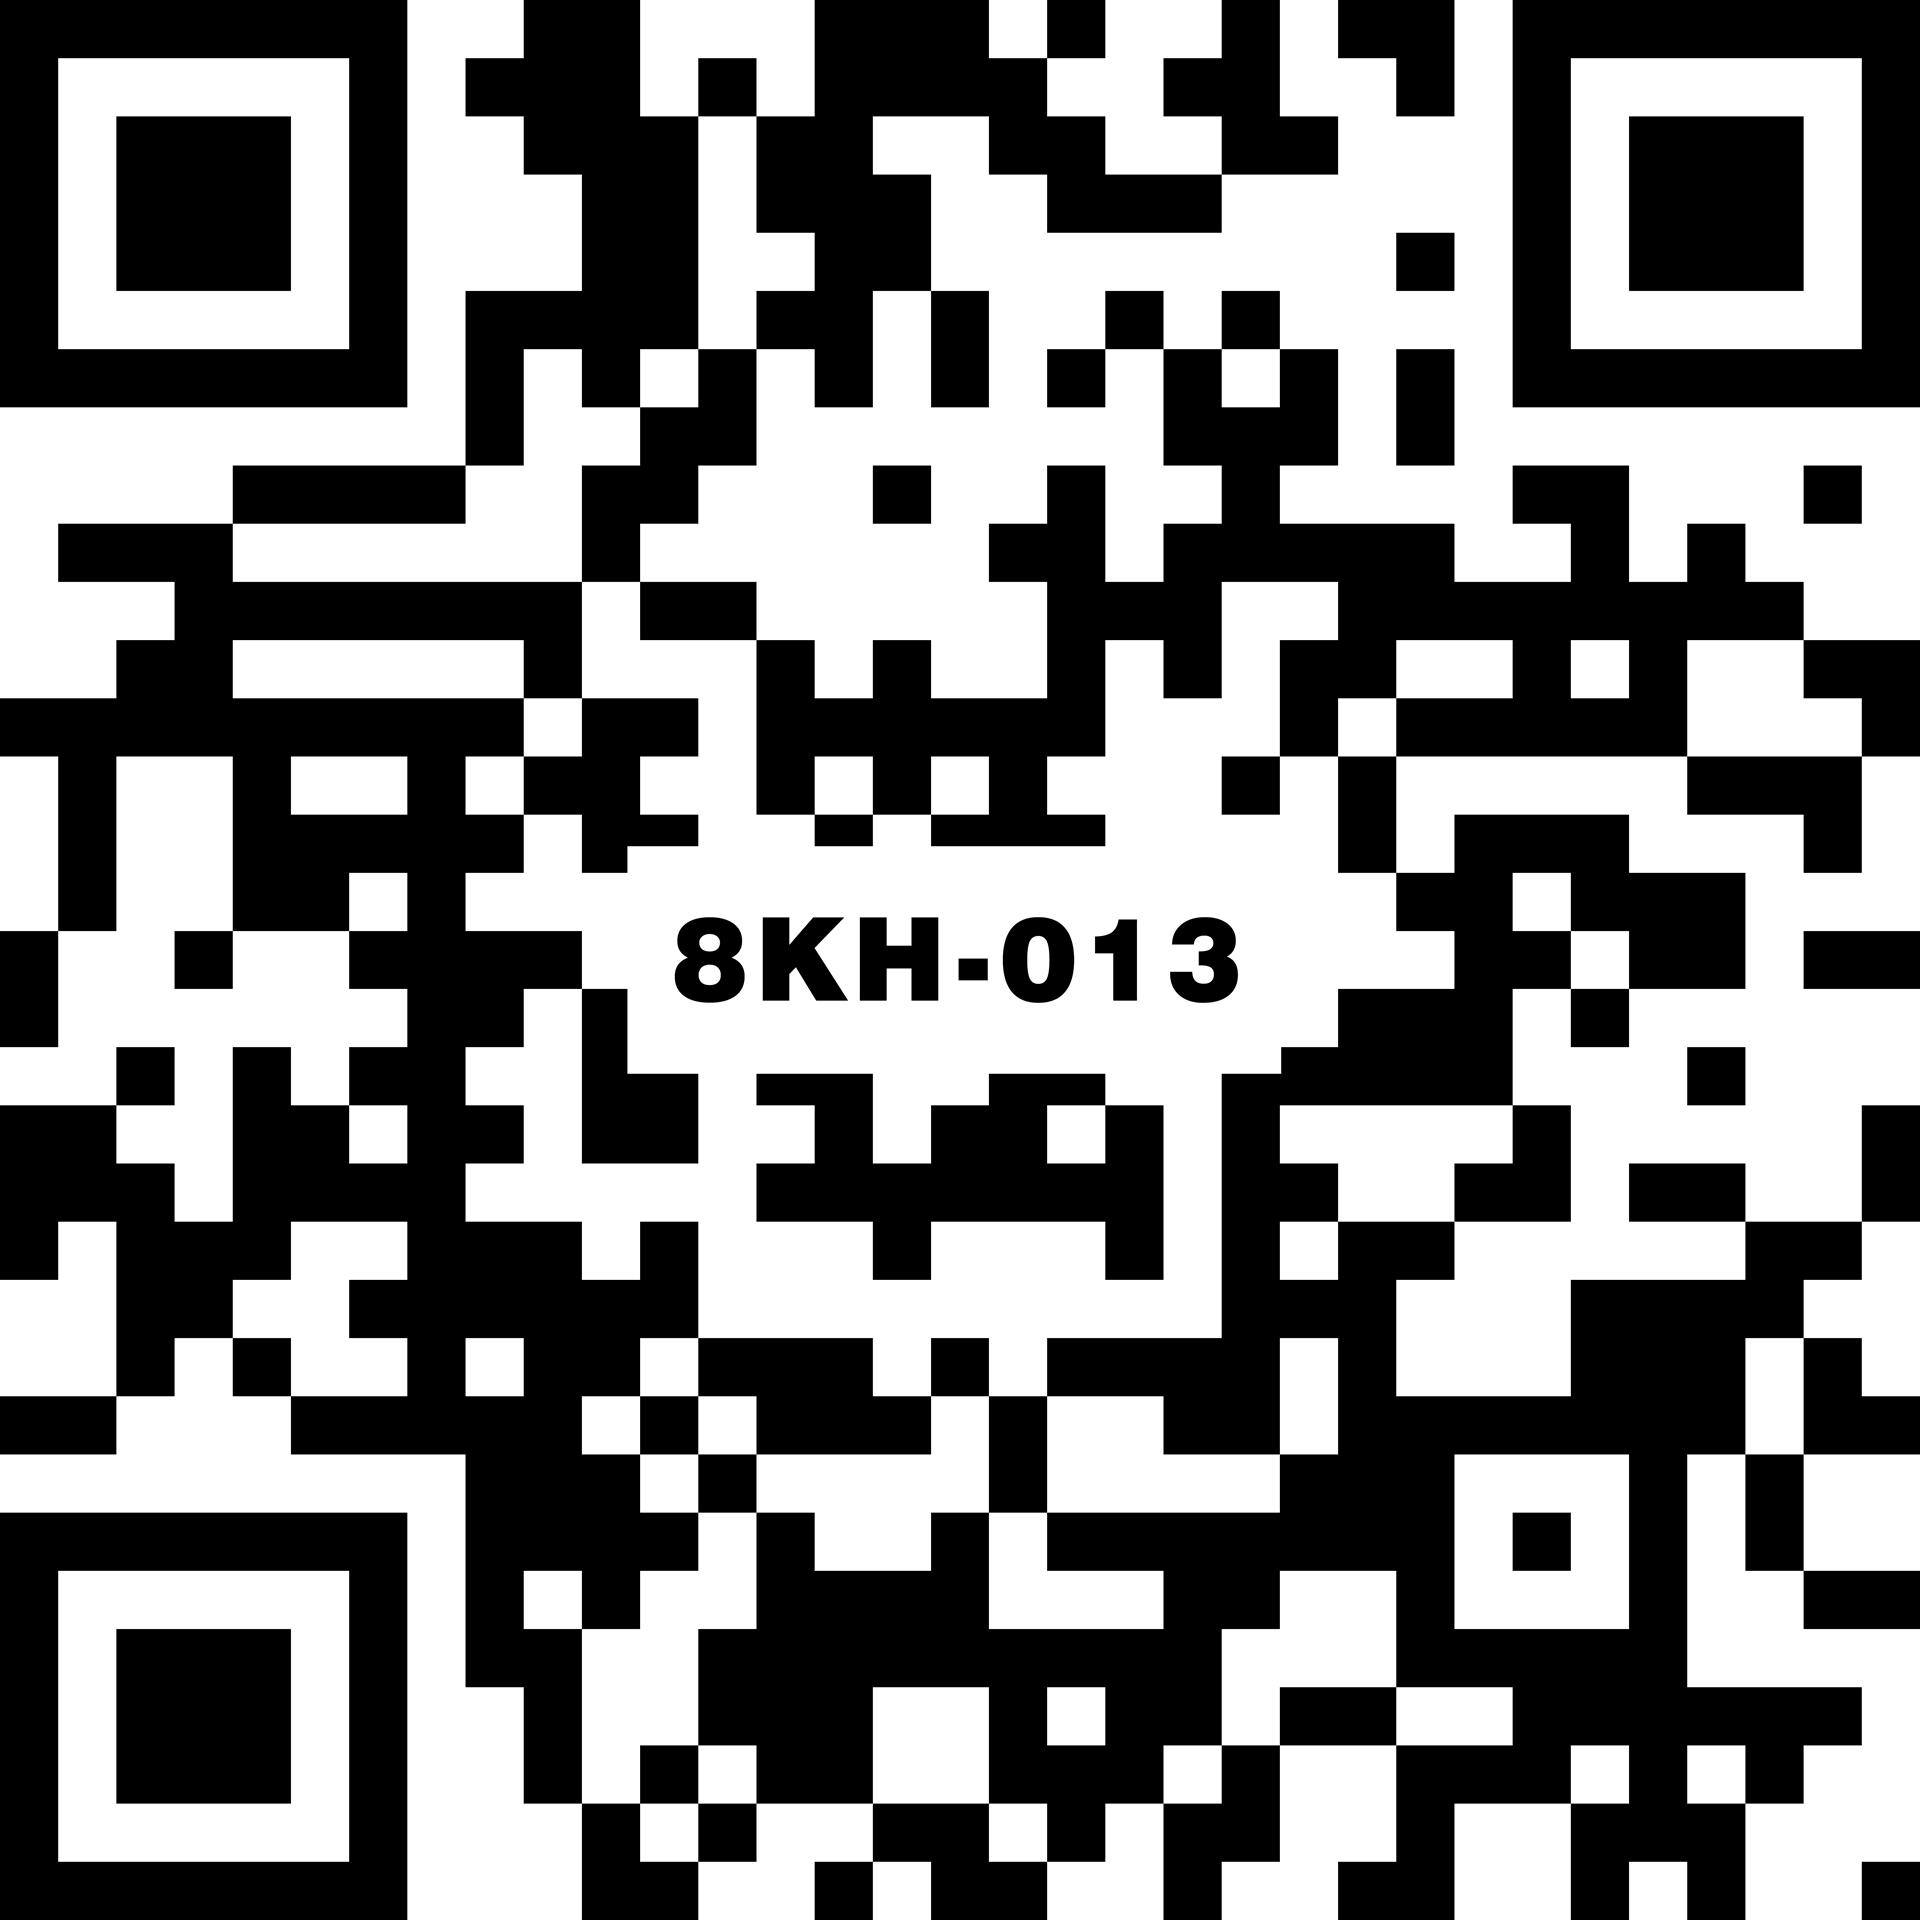 8KH-013